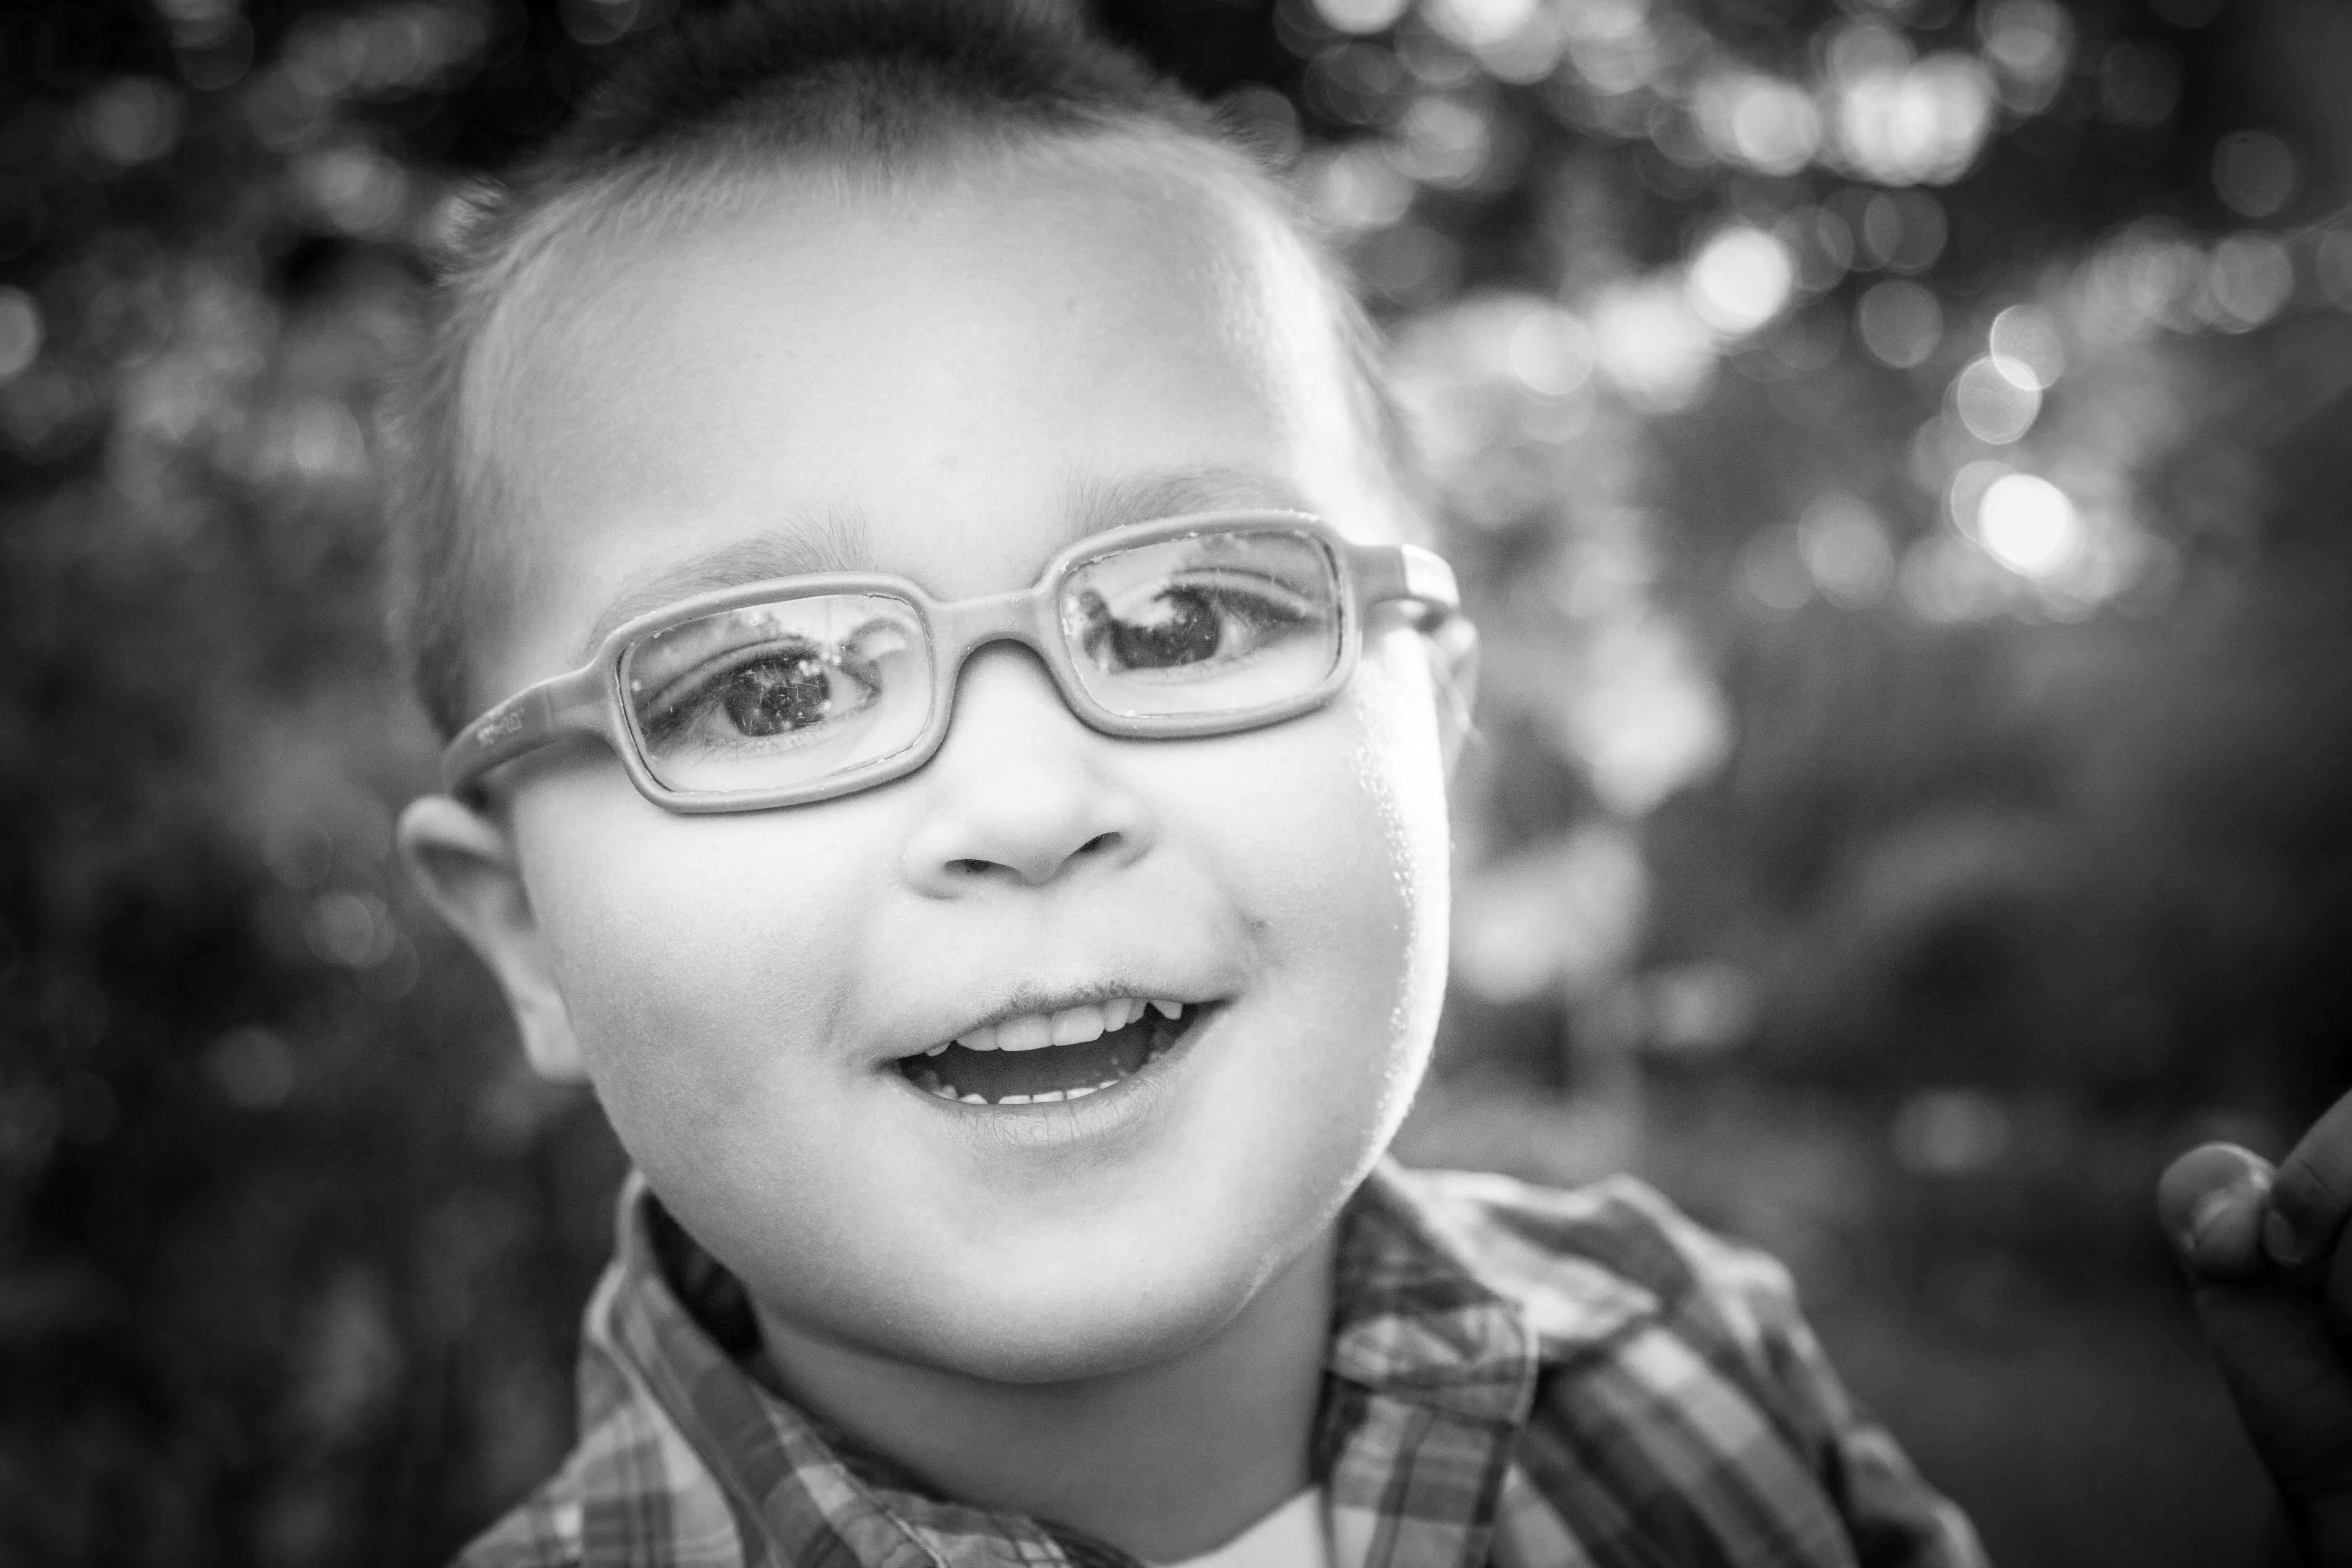 Victoria Lohnes - Giveaway session - Tehachapi - 93561 - Child Portrait - Errea House - Nilas Photog